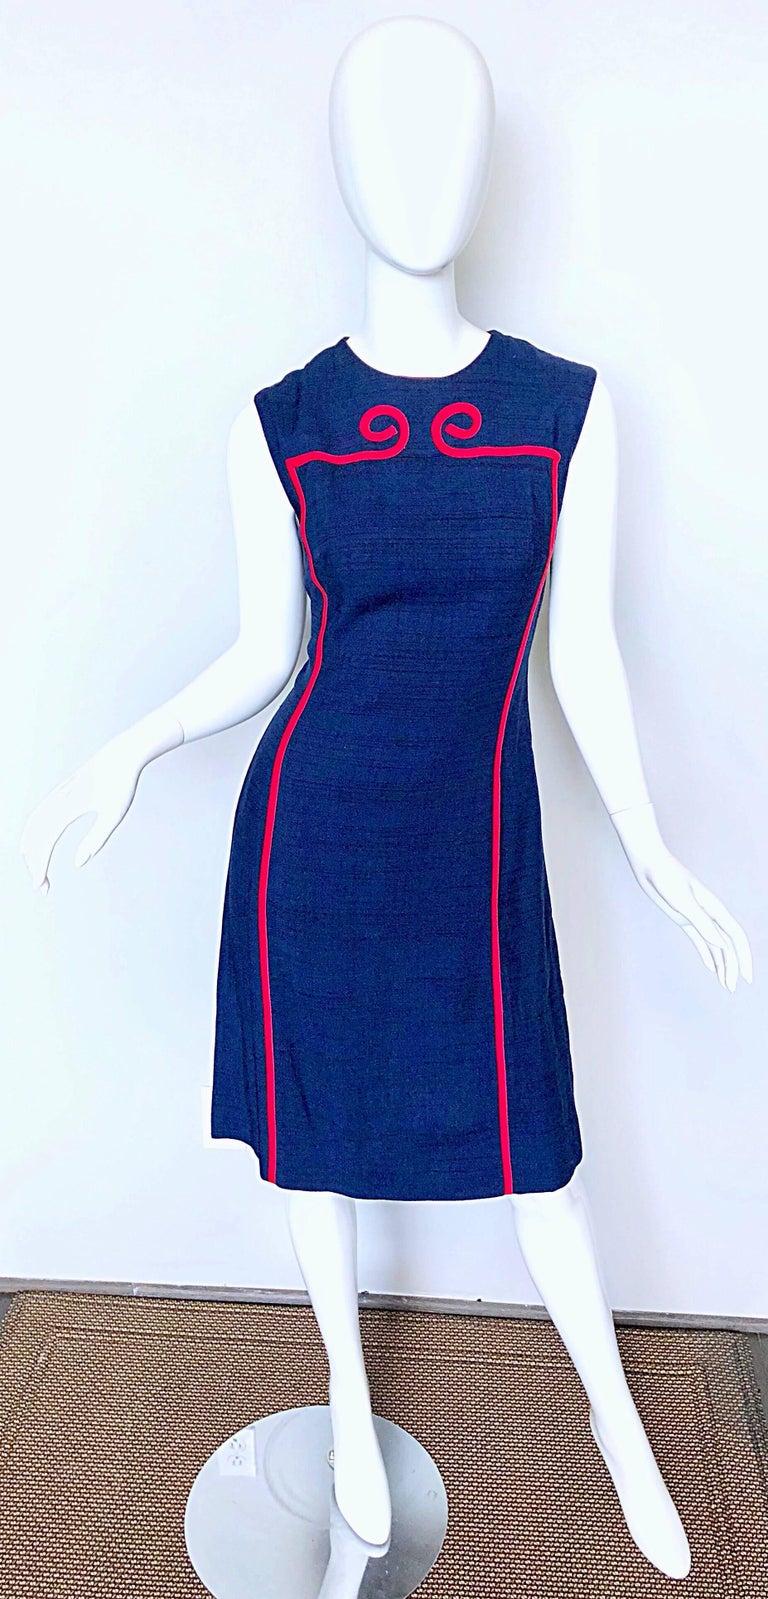 Joseph Magnin 1960s Navy Blue + Red Linen Silk Nautical Vintage 60s Shift Dress For Sale 4